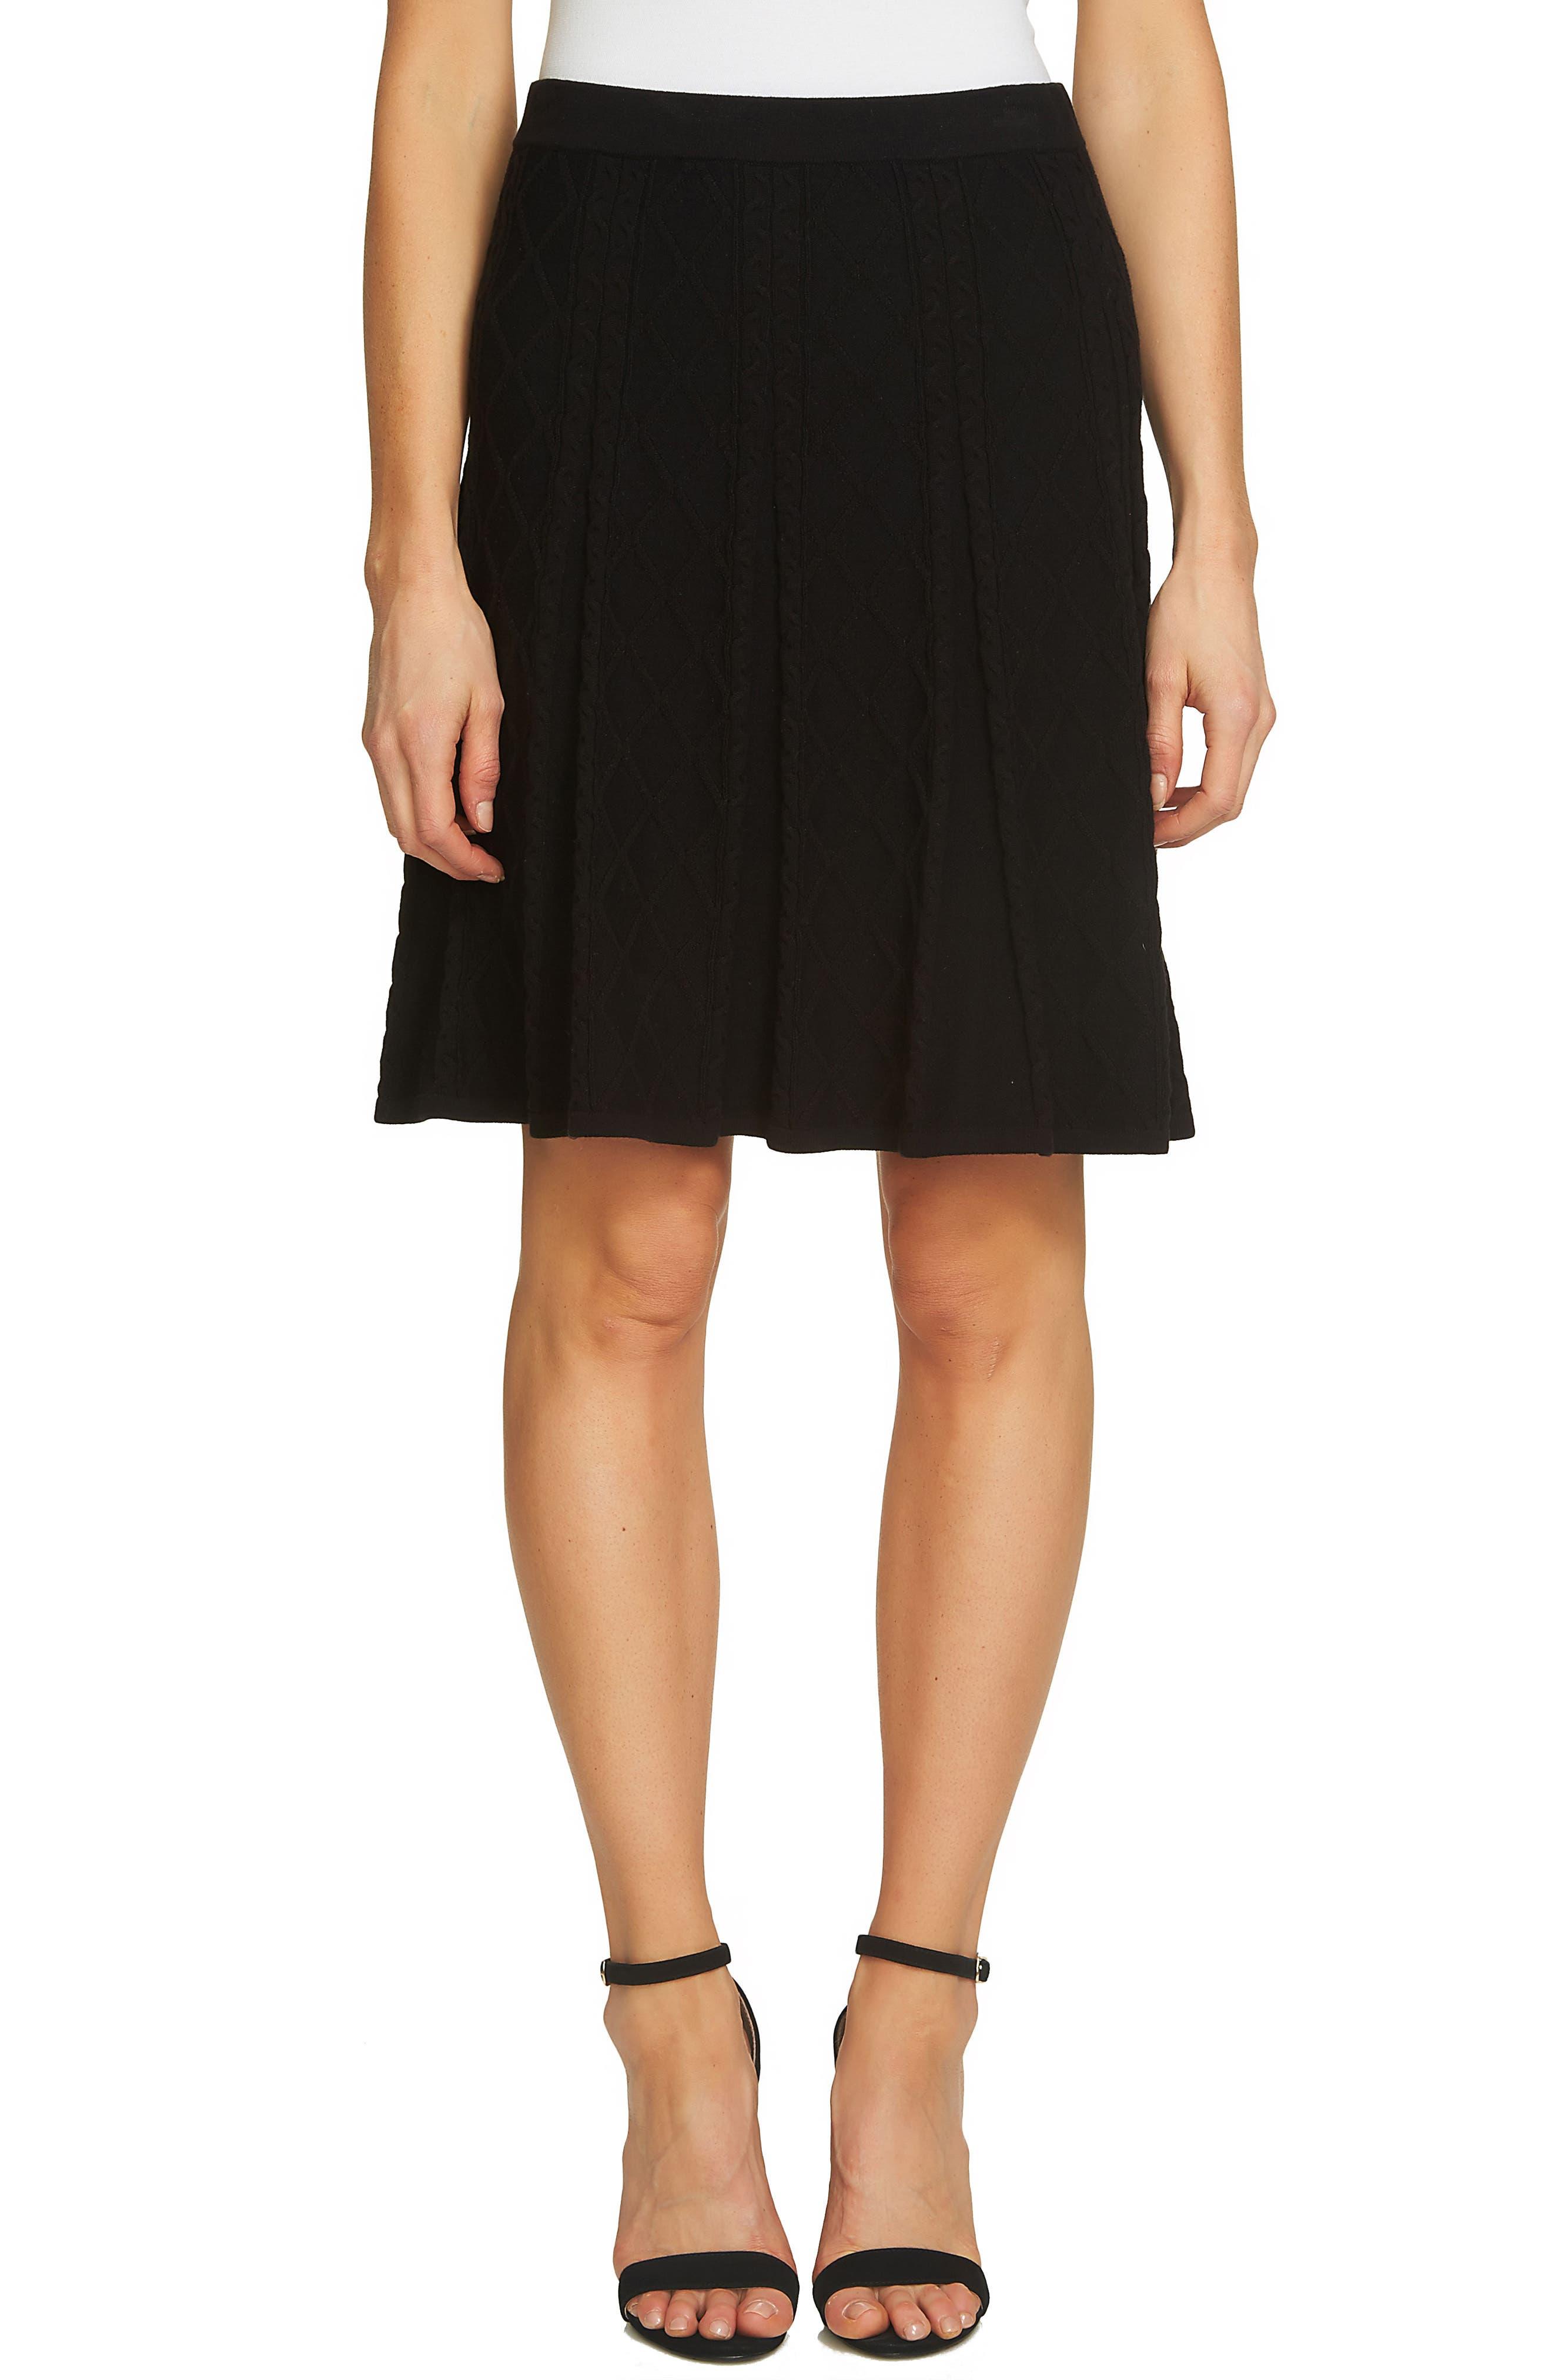 Main Image - CeCe Jacquard Knit Skirt